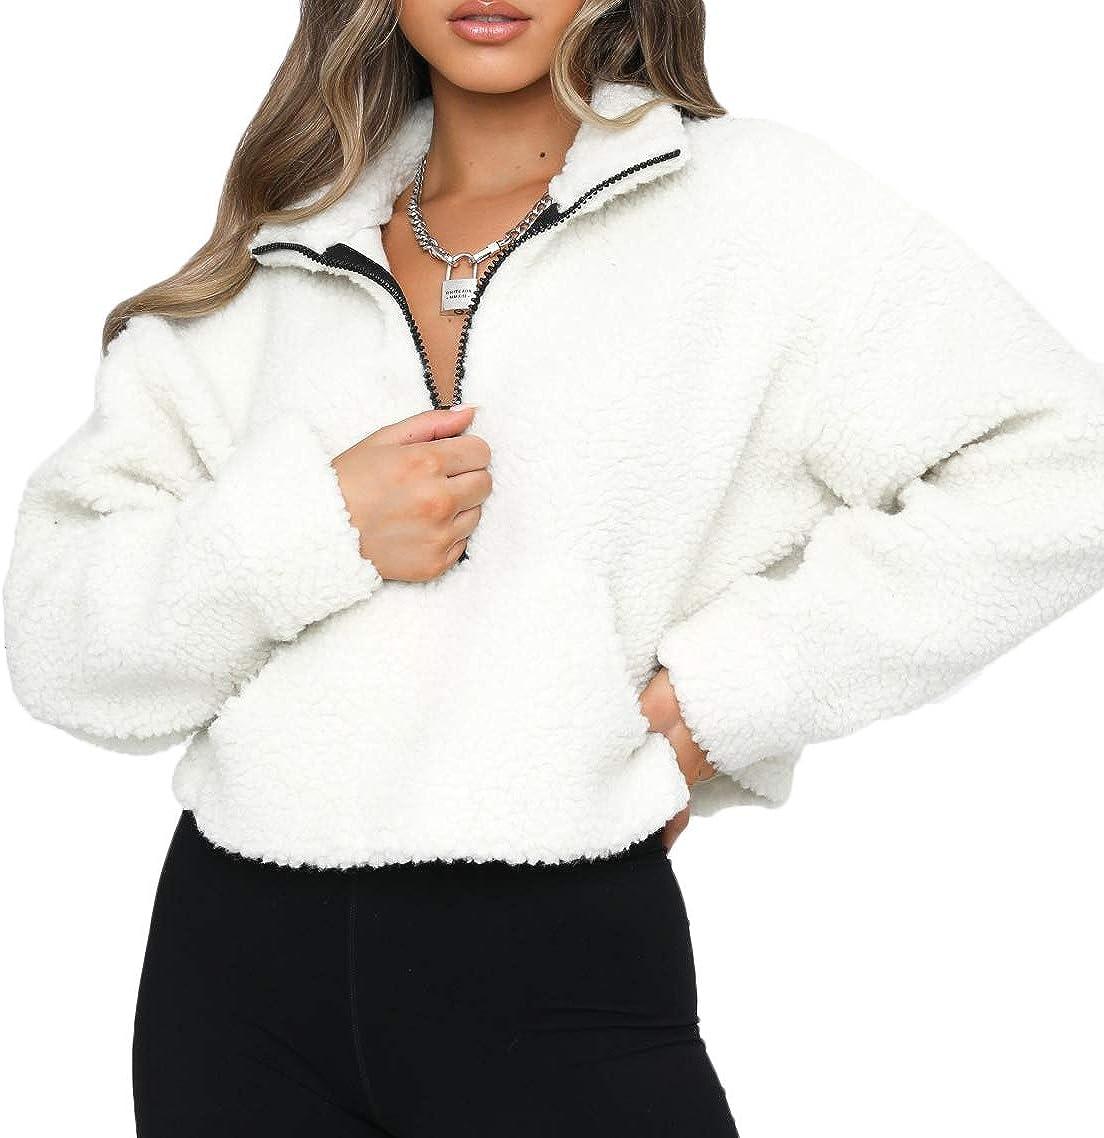 Women's Plush Hoodies Long Sleeve Jacke Super intense SALE Sweatshirt Up Japan's largest assortment Fleece Zip